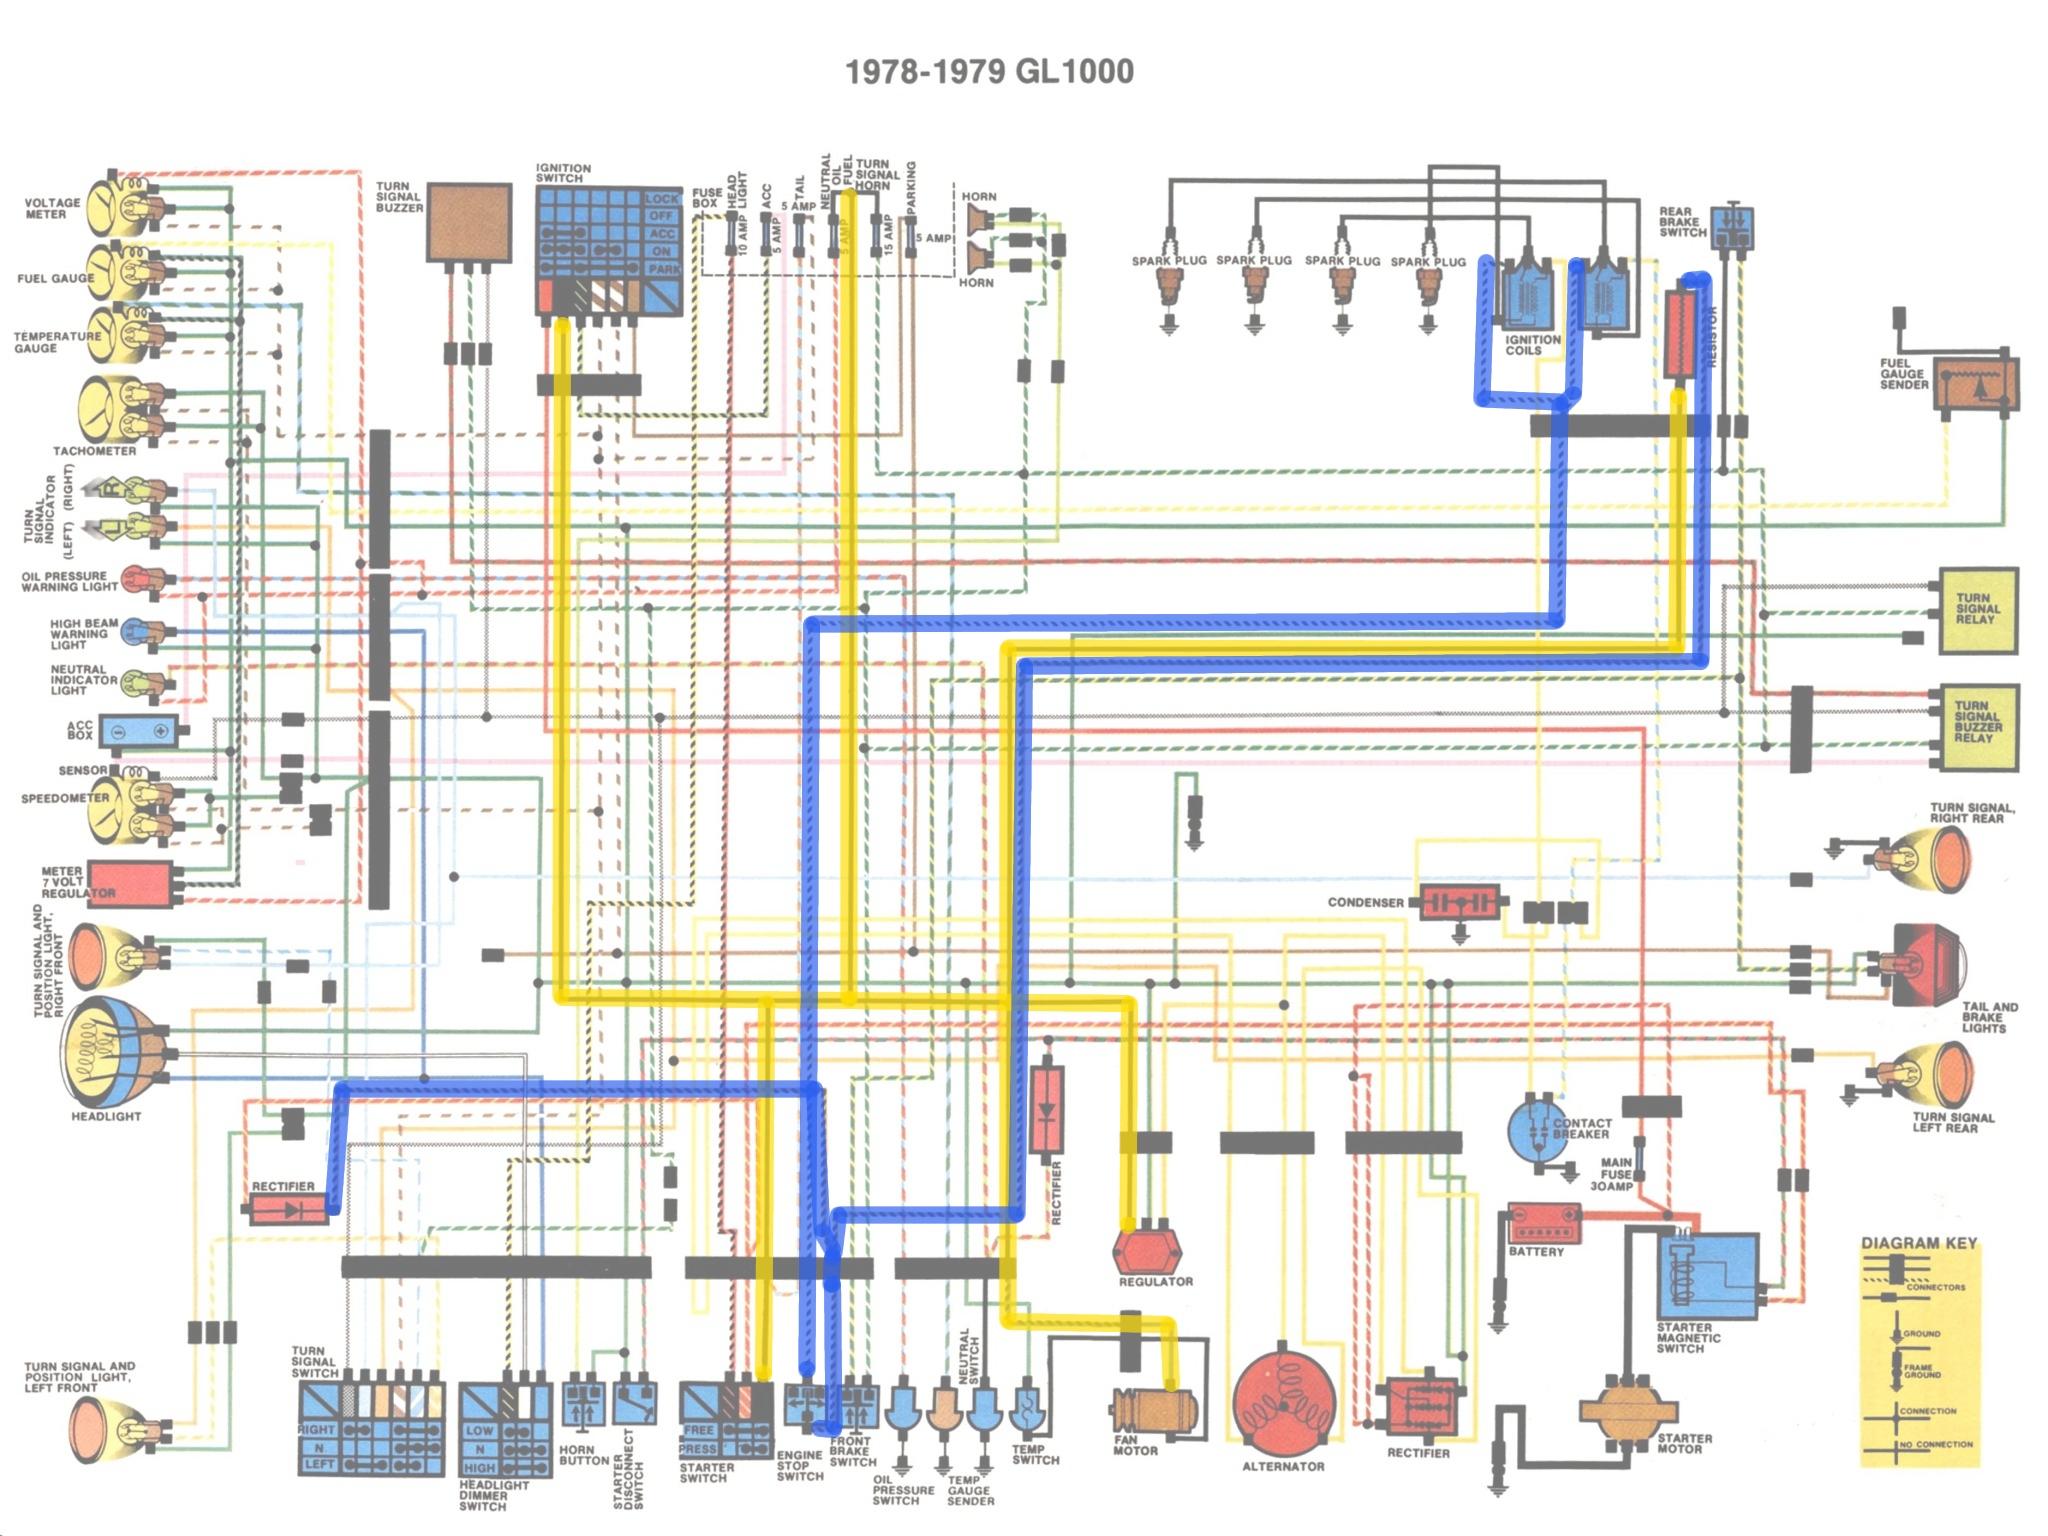 wiring diagram ktm 990 adventure wiring diagram paperktm 990 wiring diagram 12 [ 2048 x 1536 Pixel ]